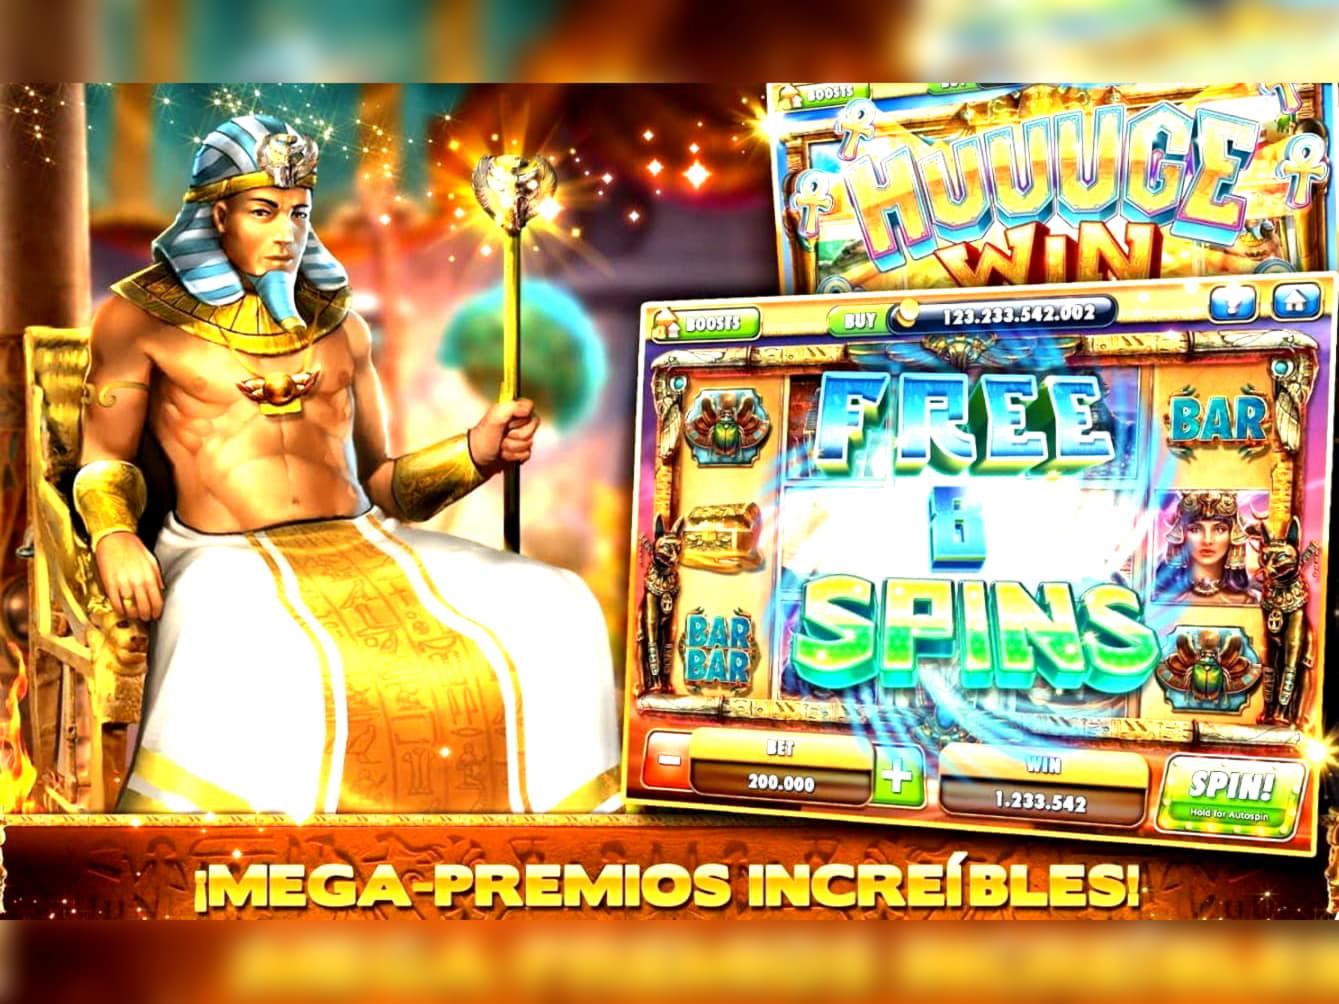 €111 FREE Casino Chip at Gamebookers Casino